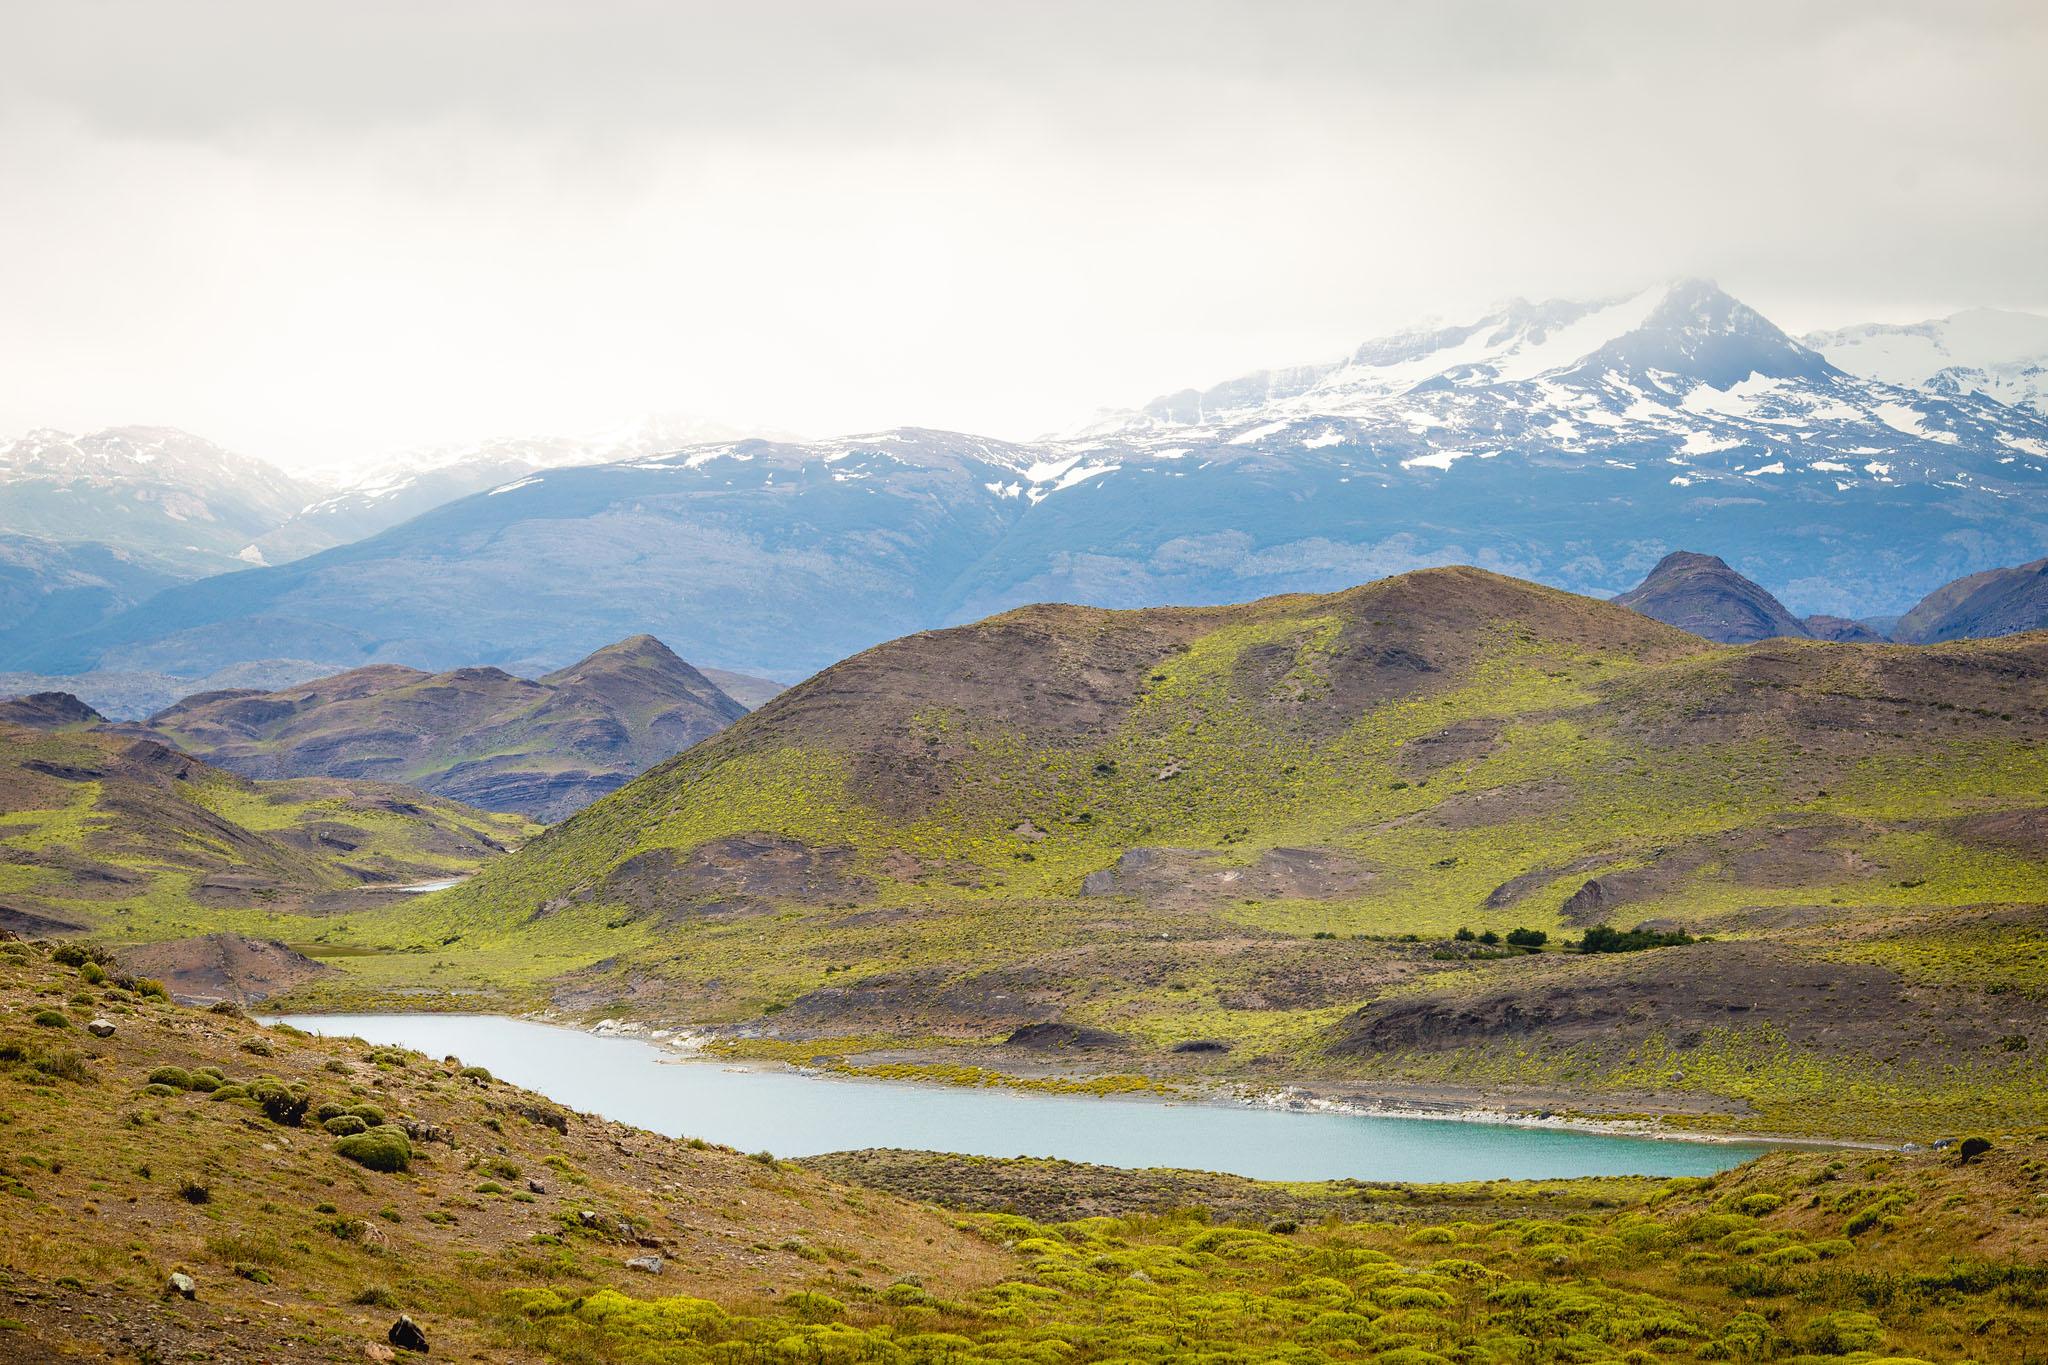 Wedding-Travellers-Overlanding-Destination-Wedding-Chile-Torres-del-Paine-laguna-lake-amarga